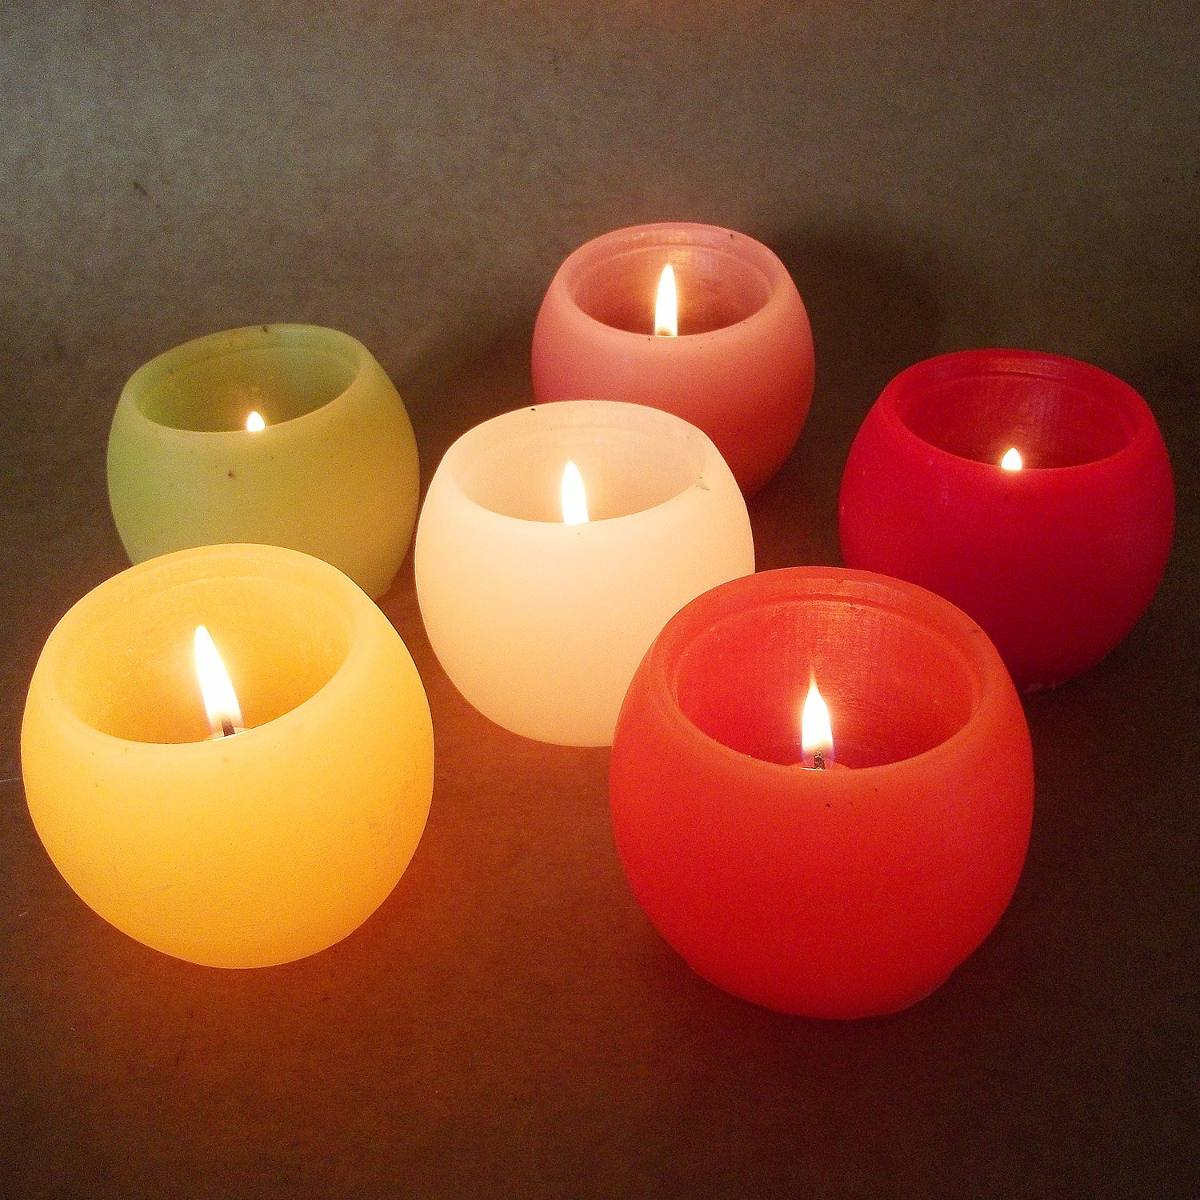 Velas decorativas kit com 5 mini luminarias r 55 90 - Velas decorativas ...